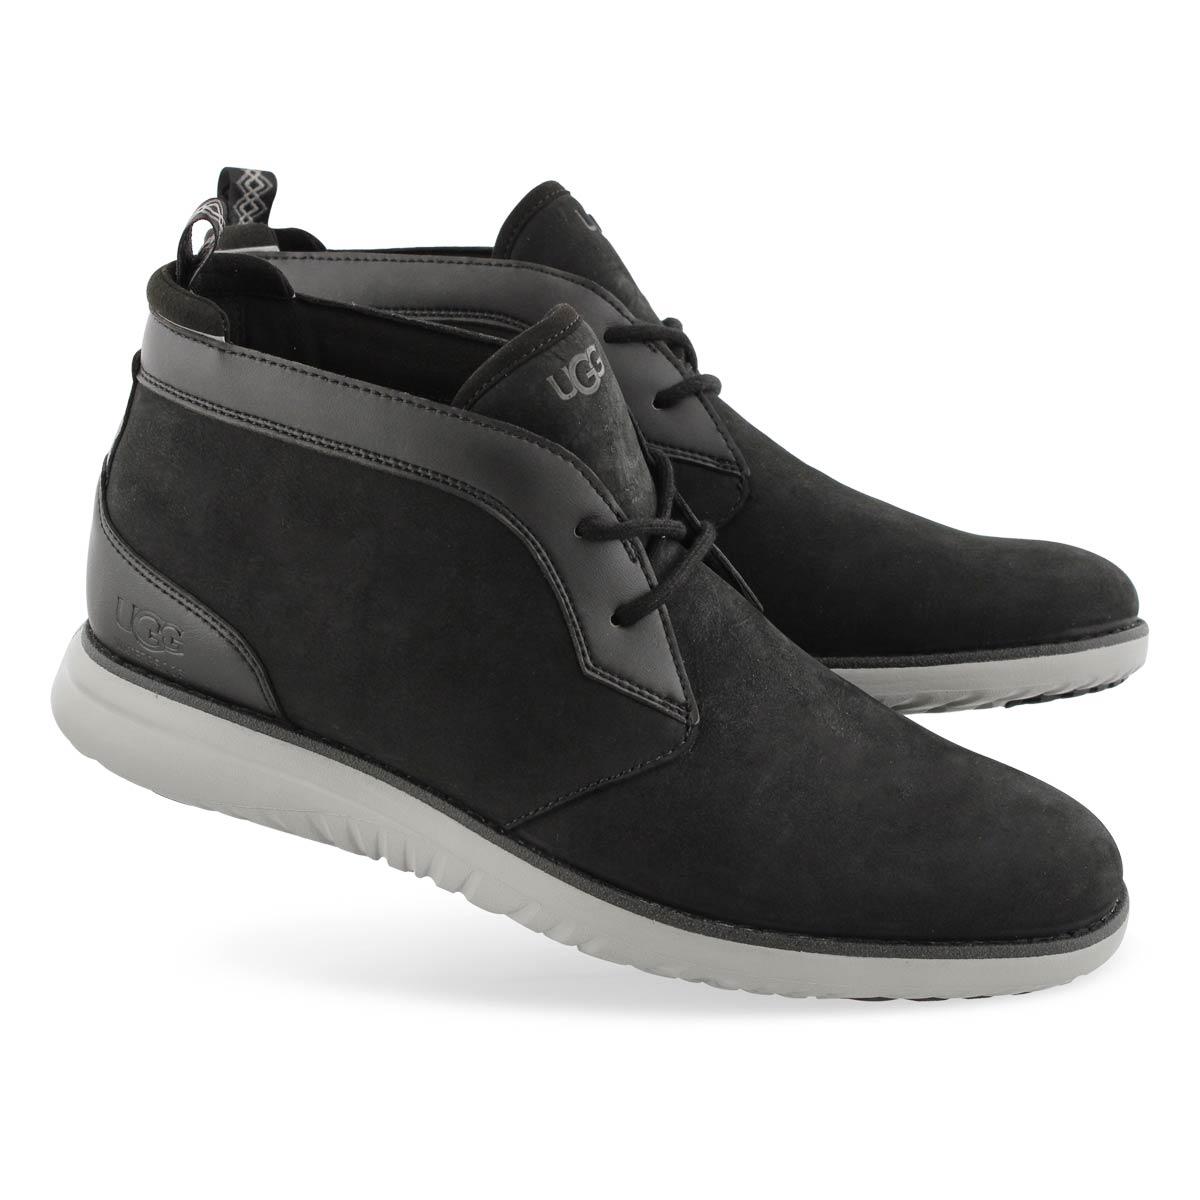 Mens Union Waterproof Chukka Boot - Black